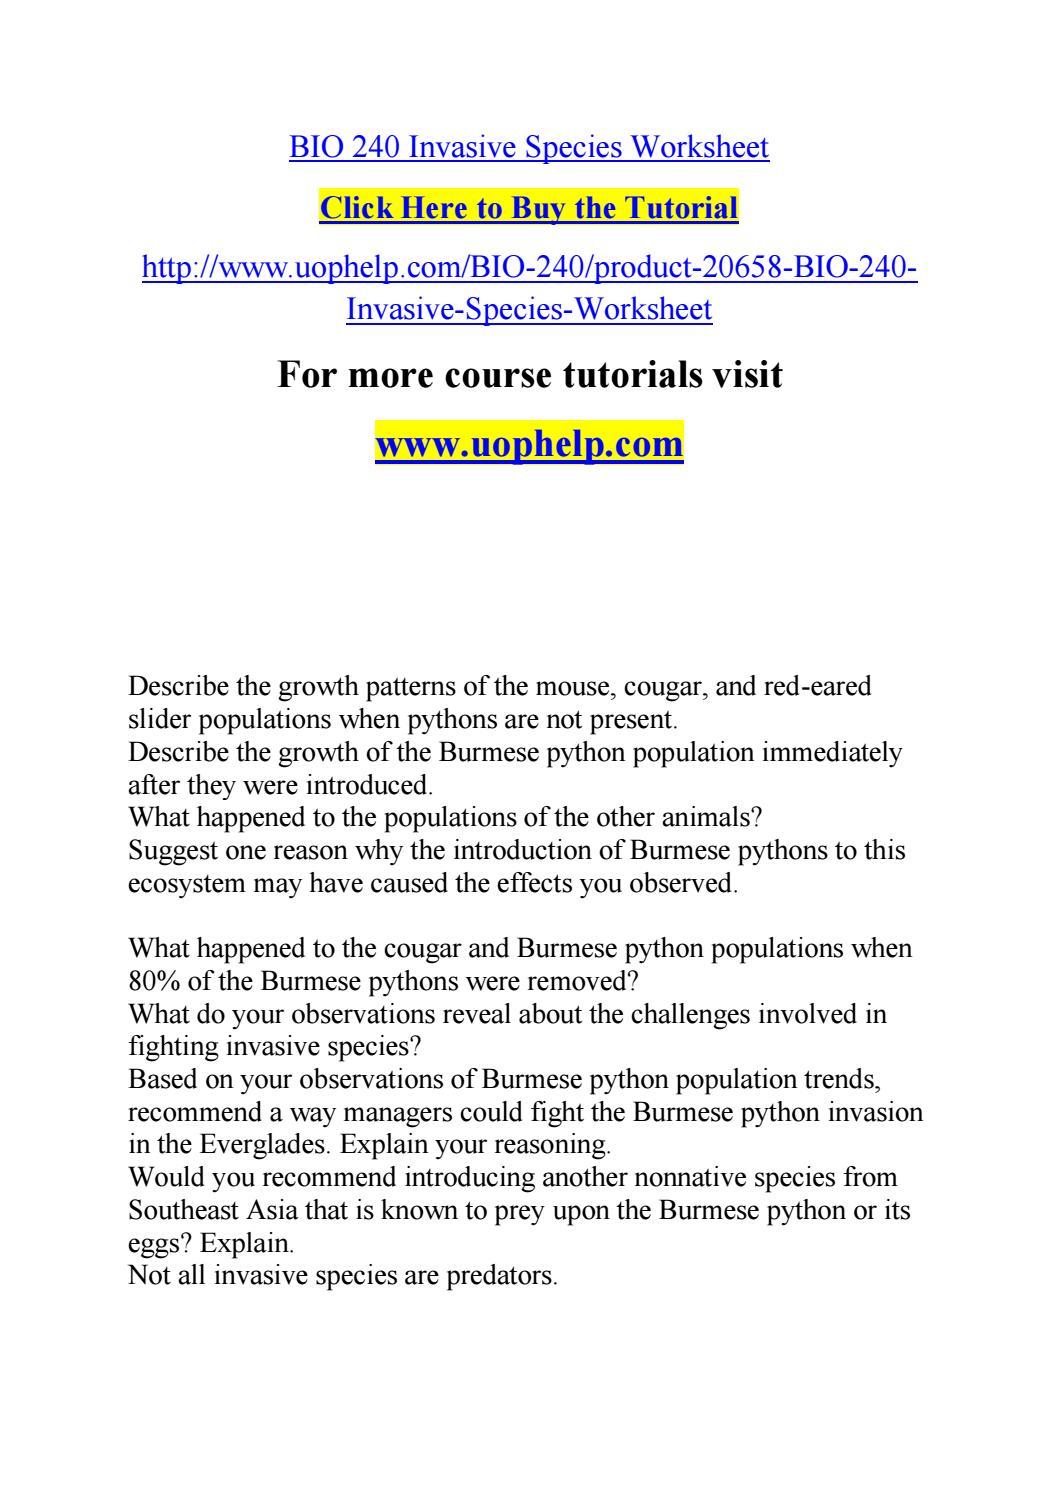 Bio 240 invasive species worksheet by jabbaree161   Issuu